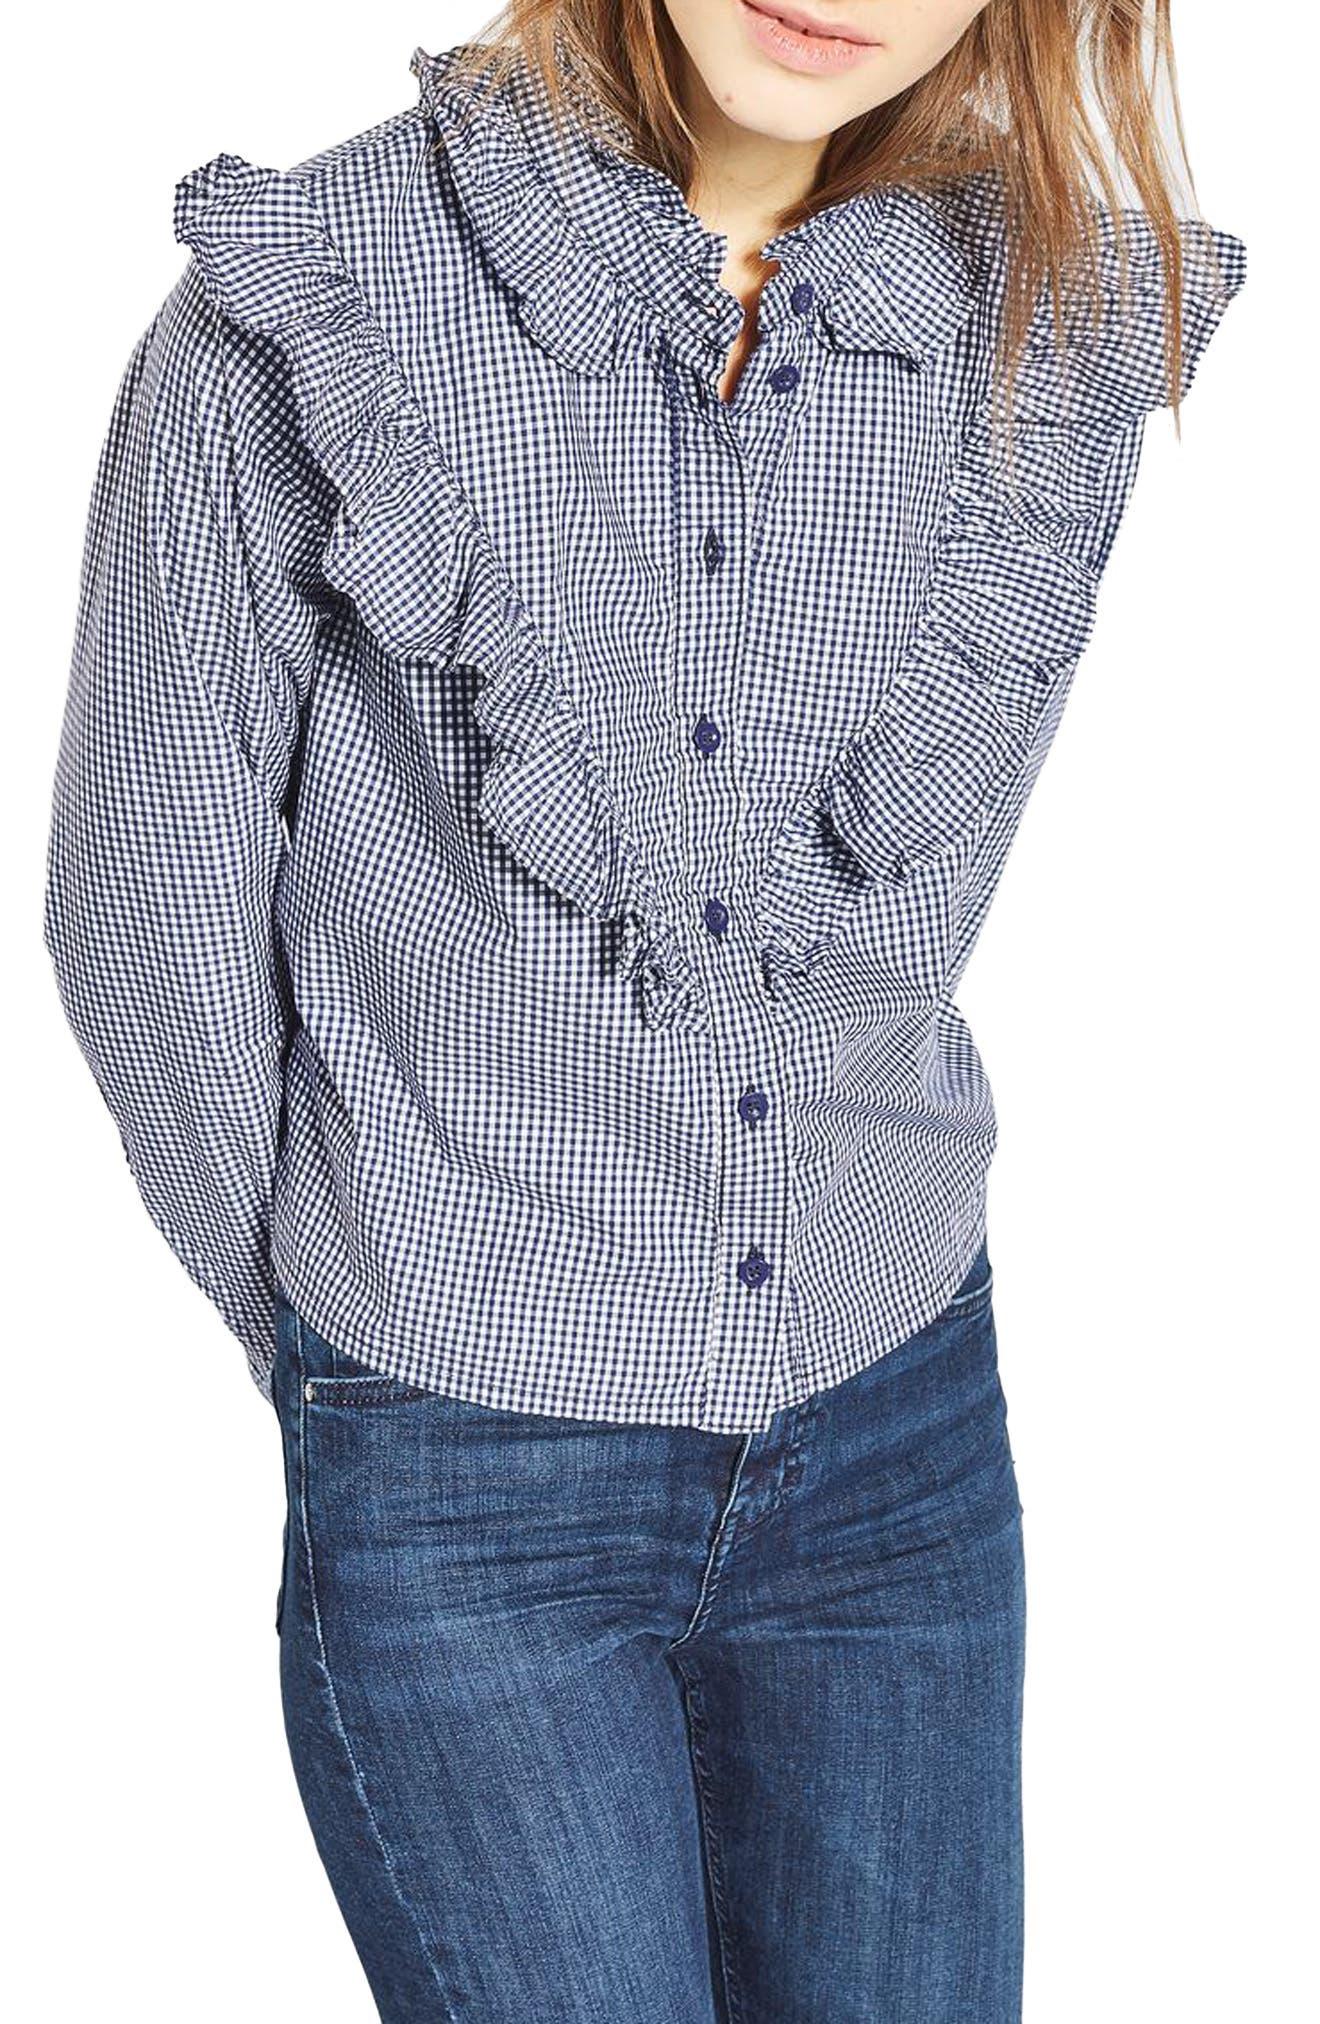 Main Image - Topshop Moto Ruffle Gingham Shirt